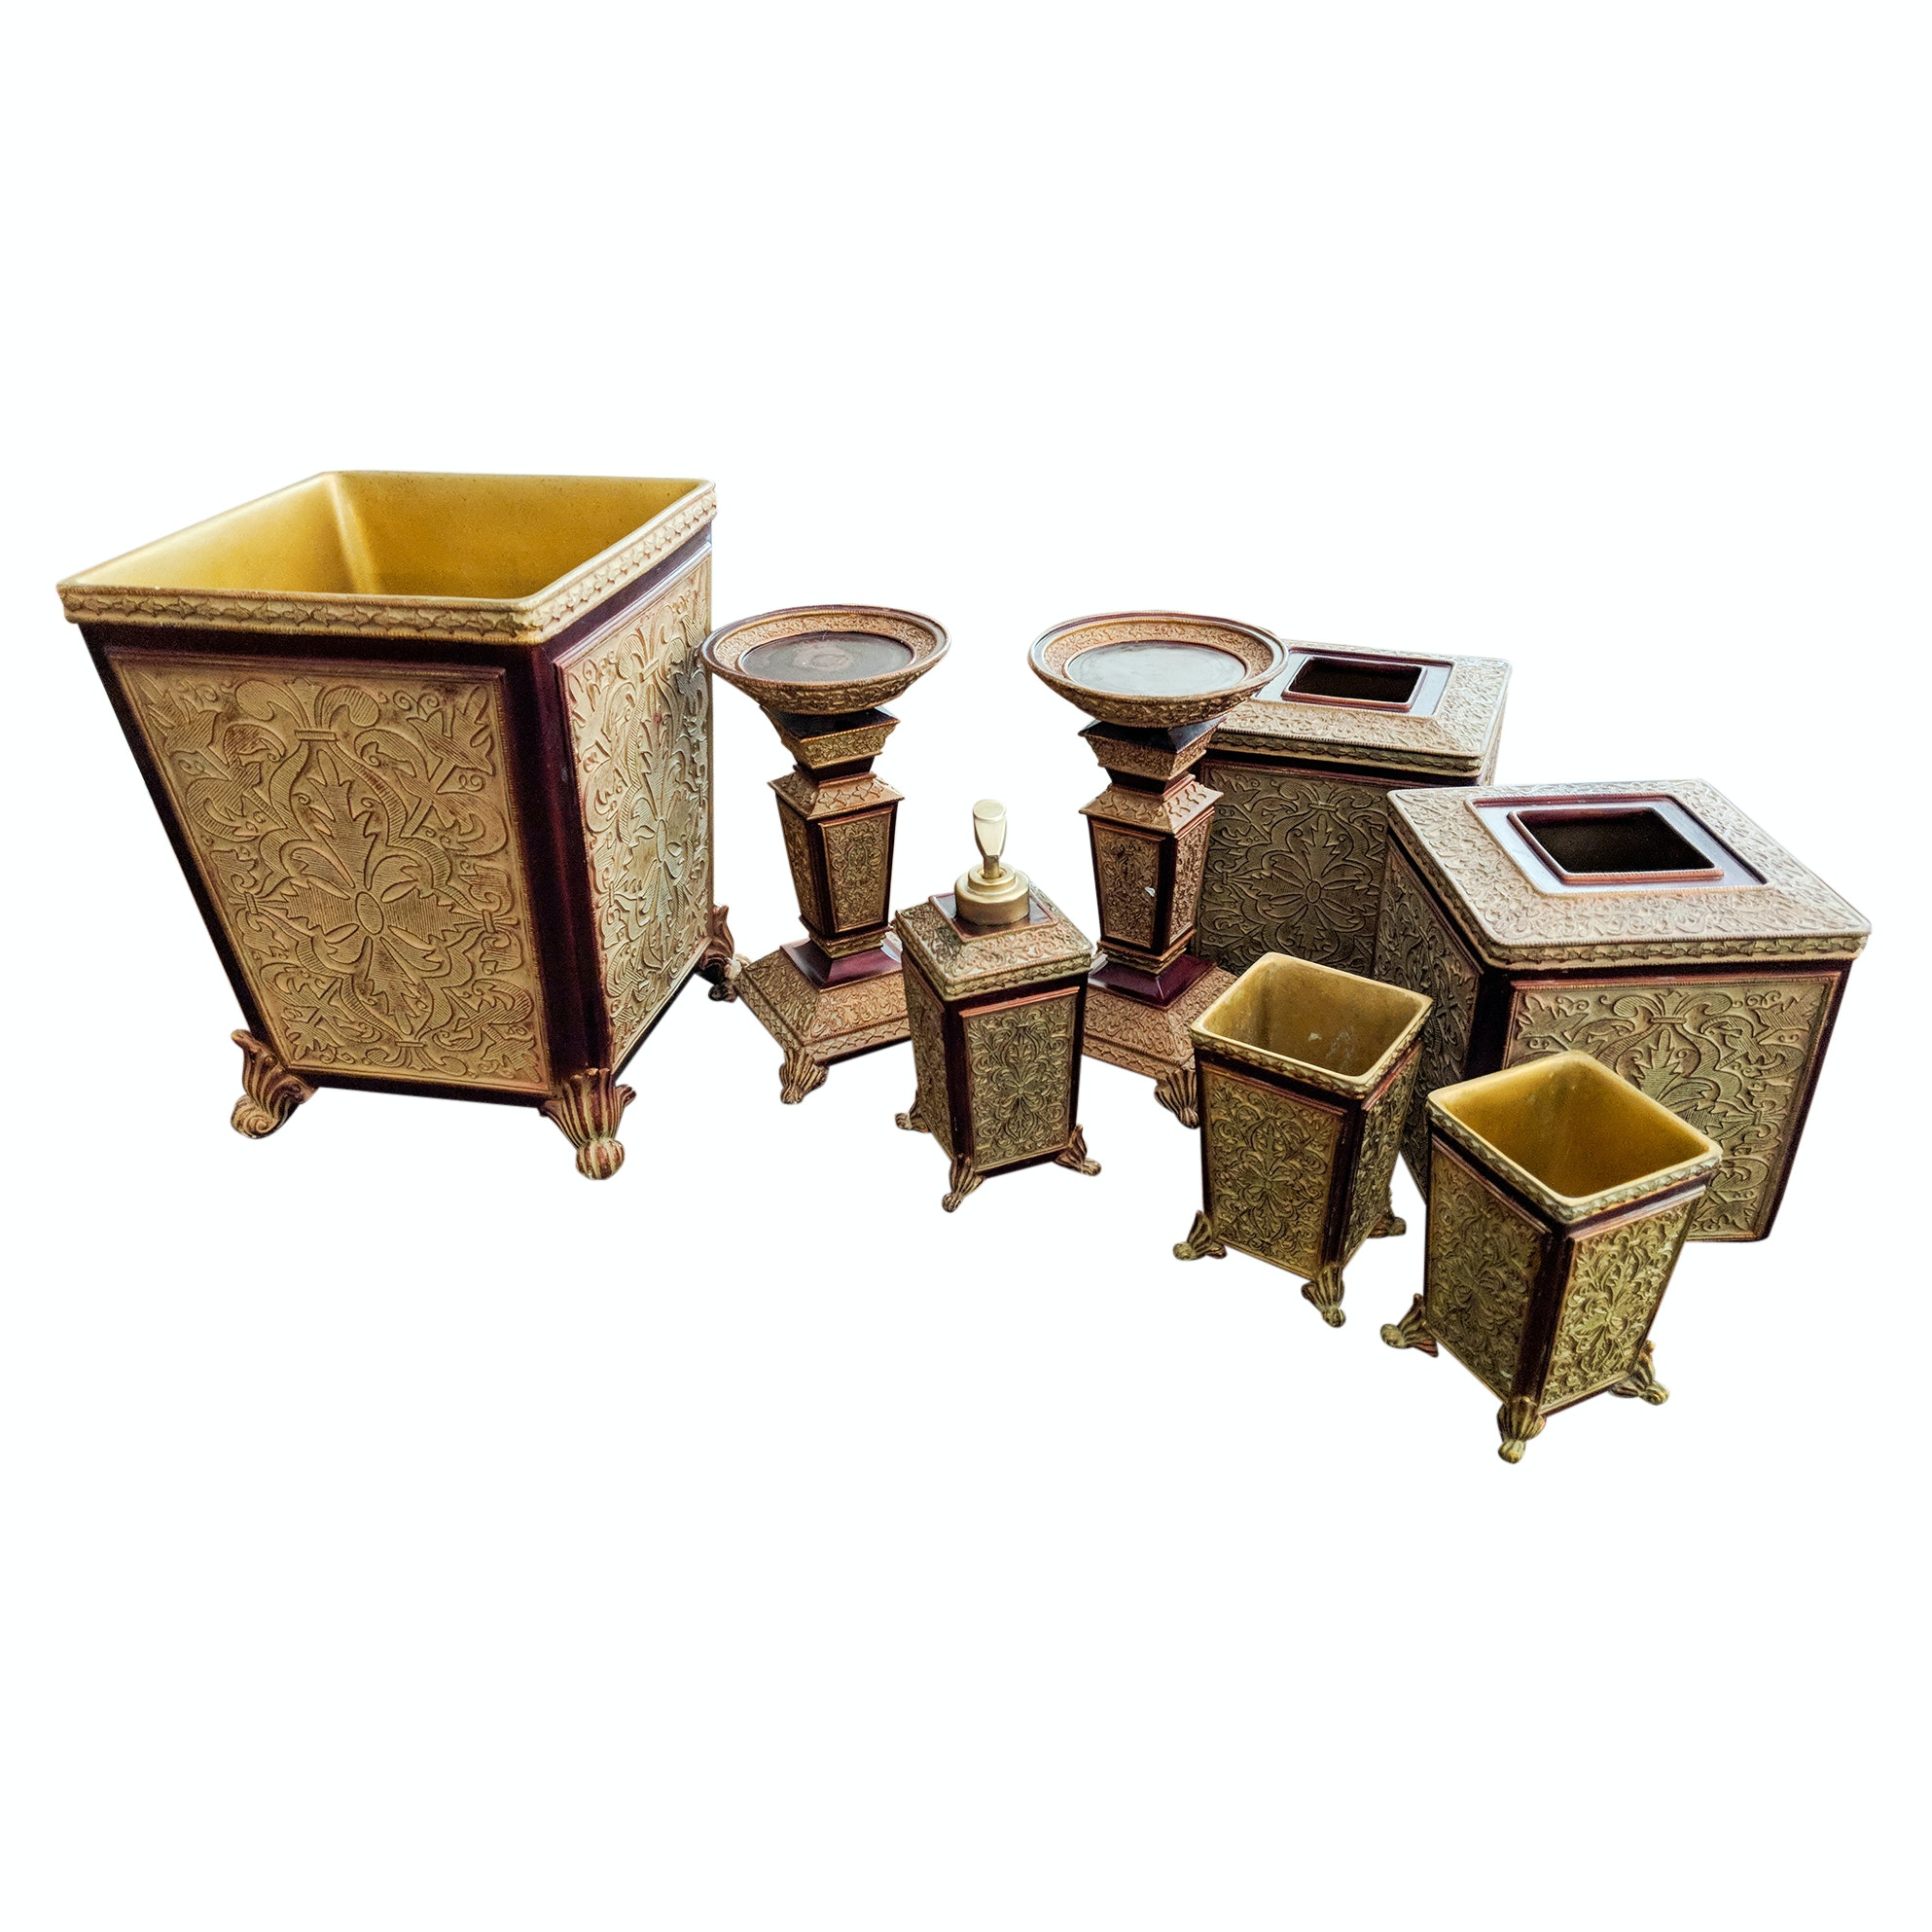 Versailles 8-Piece Resin Bathroom Accessories and Vanity Set